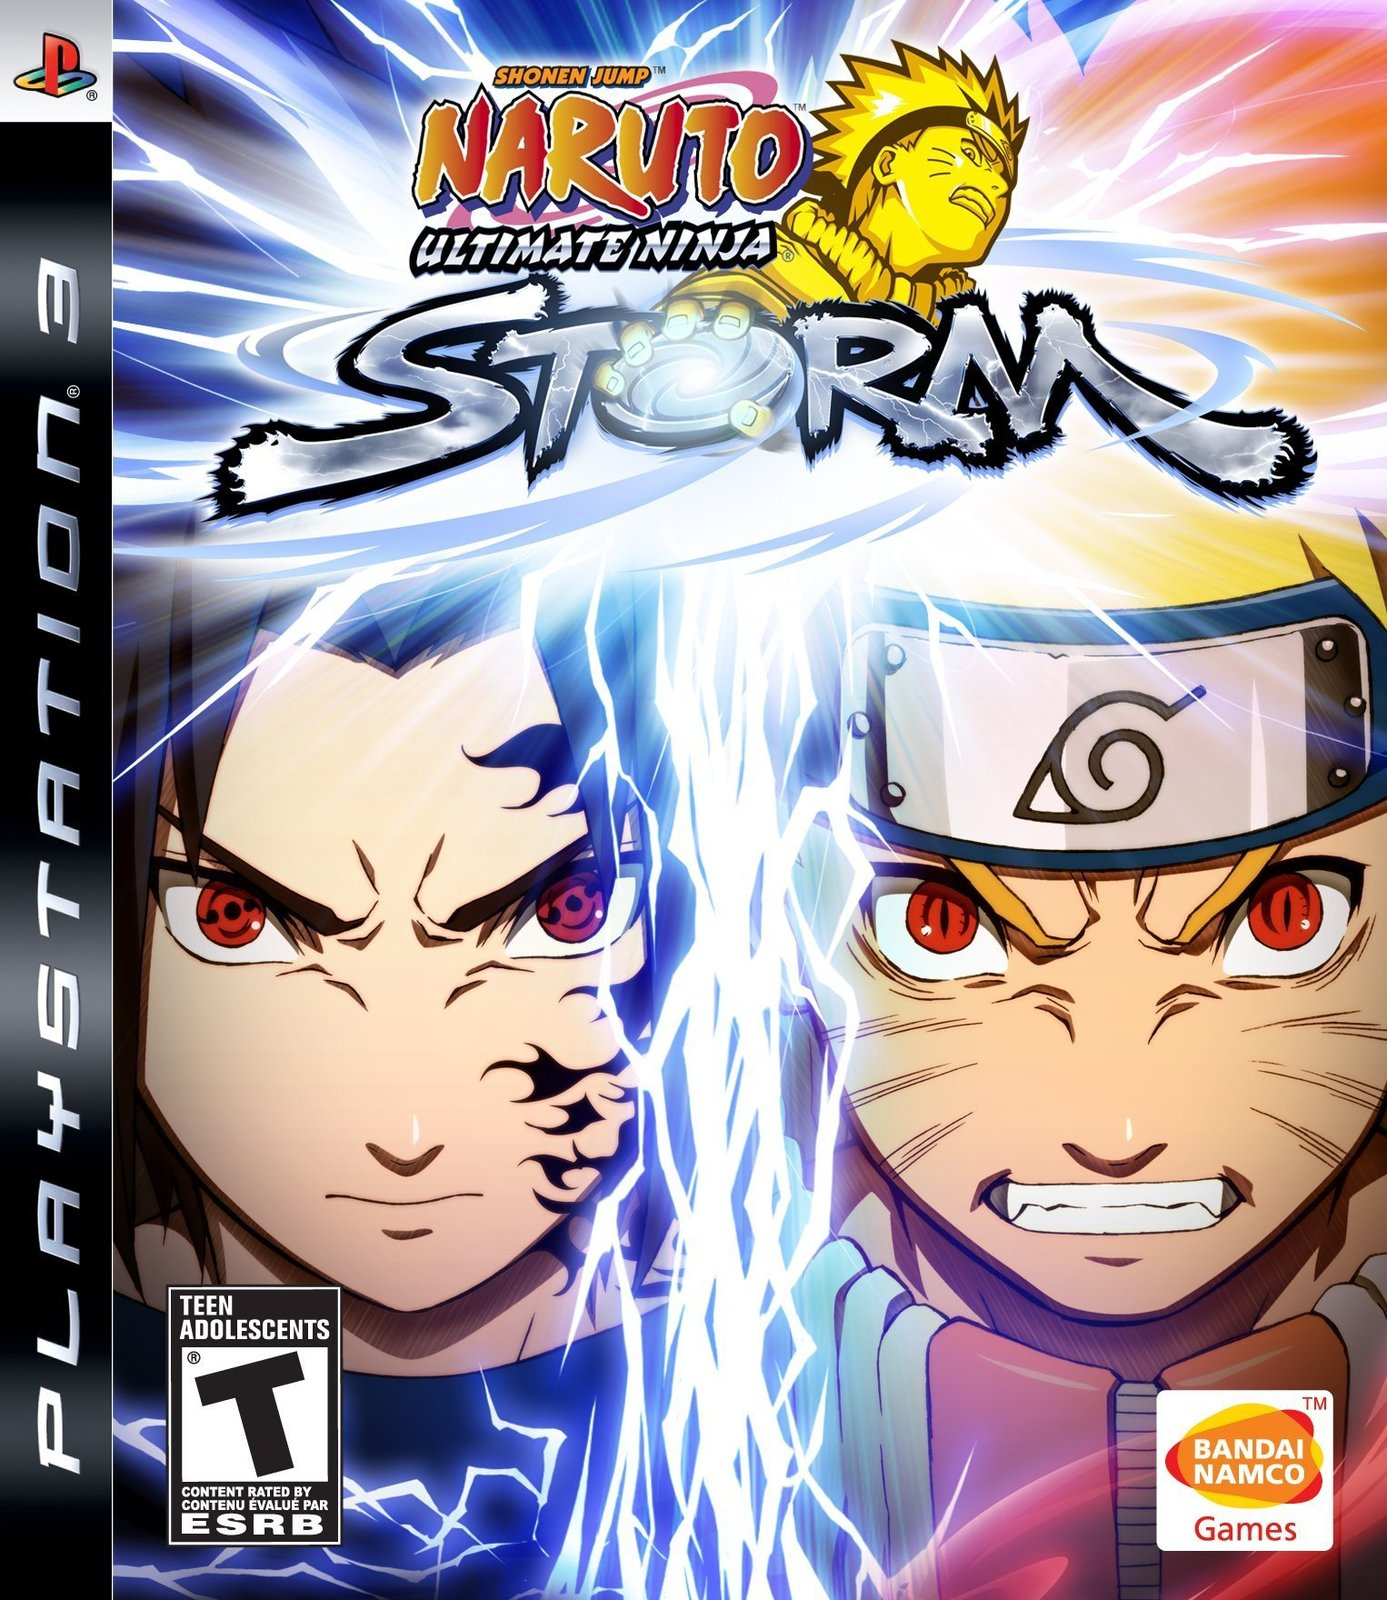 Naruto: Ultimate Ninja Storm   Narutopedia   Fandom powered by Wikia